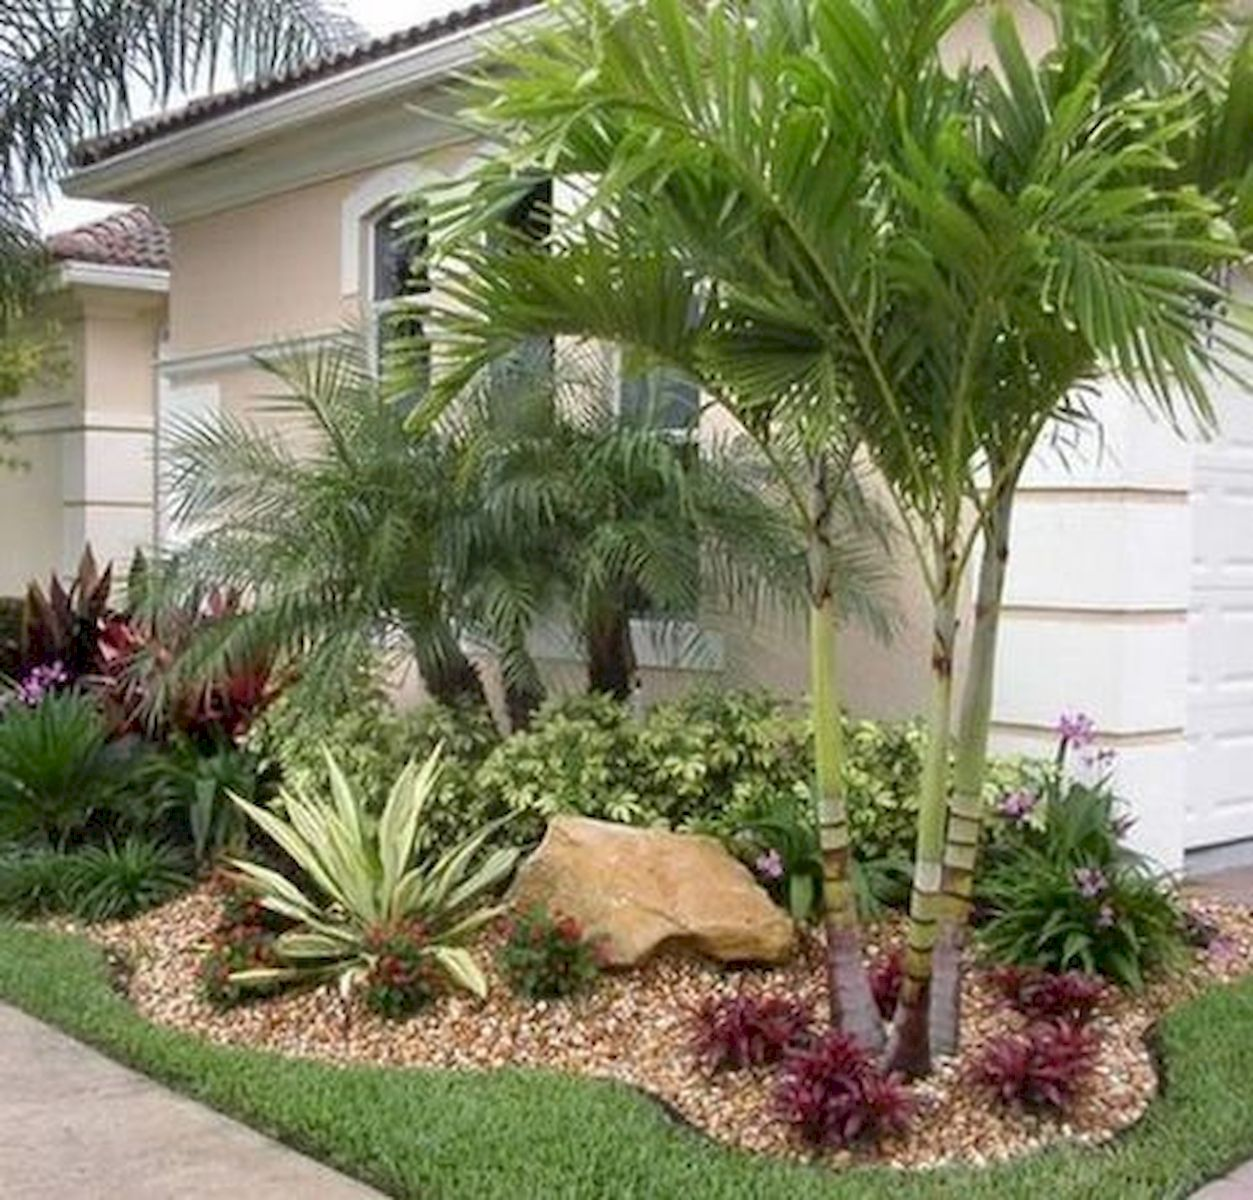 48 Stunning Front Yard Landscaping Ideas That Make Beautiful Garden (39)